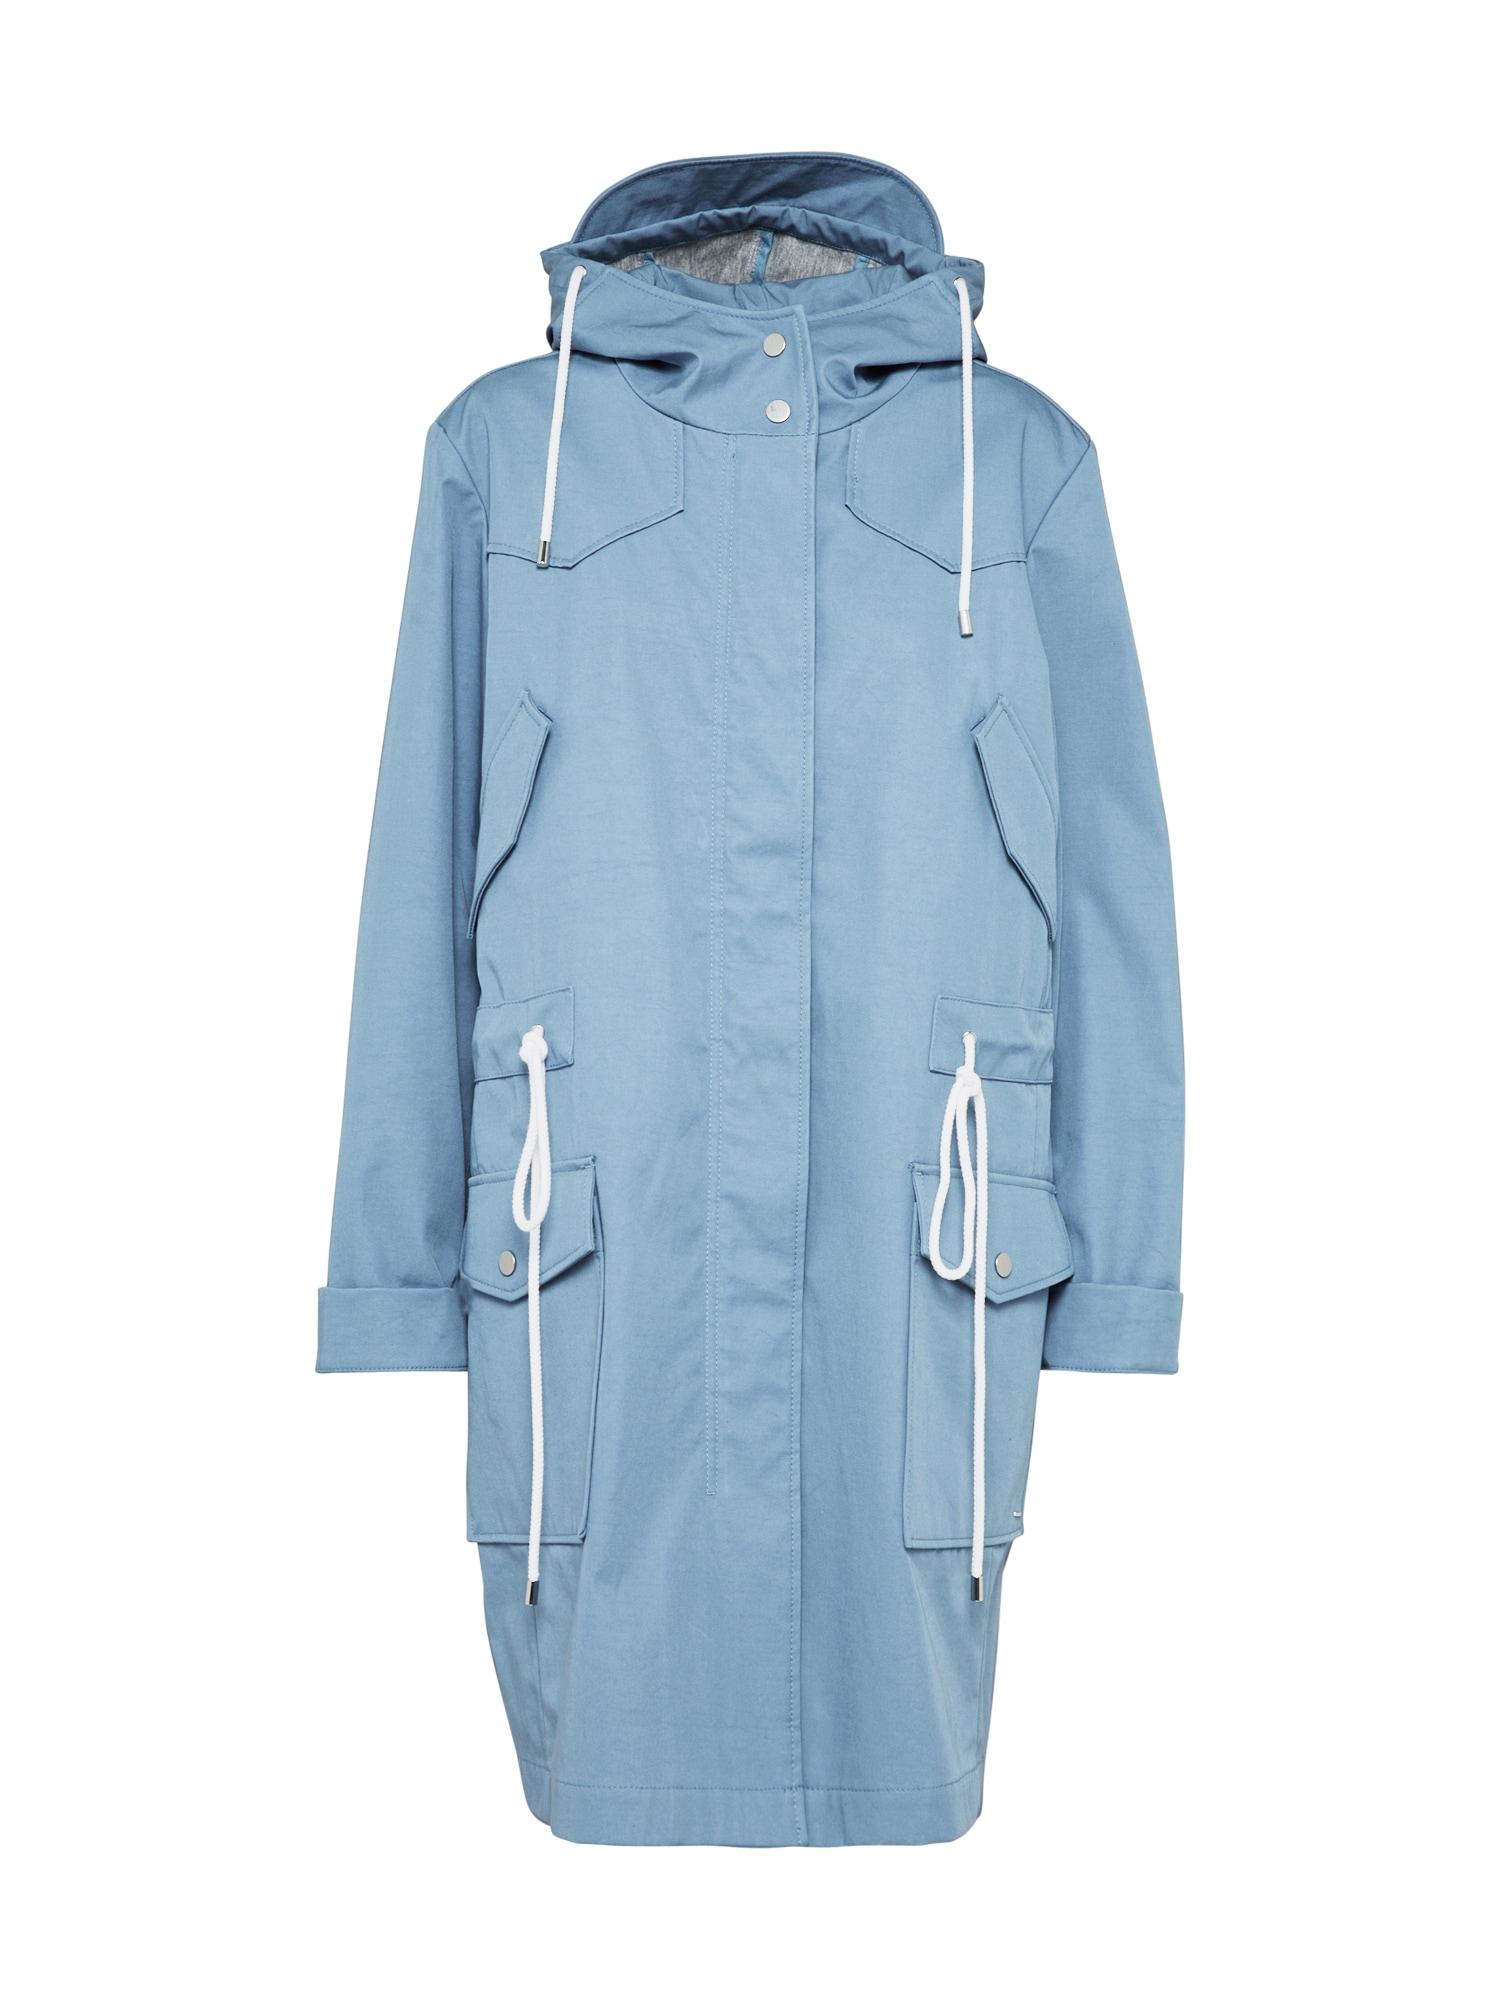 Přechodný kabát Obony aqua modrá bílá BOSS